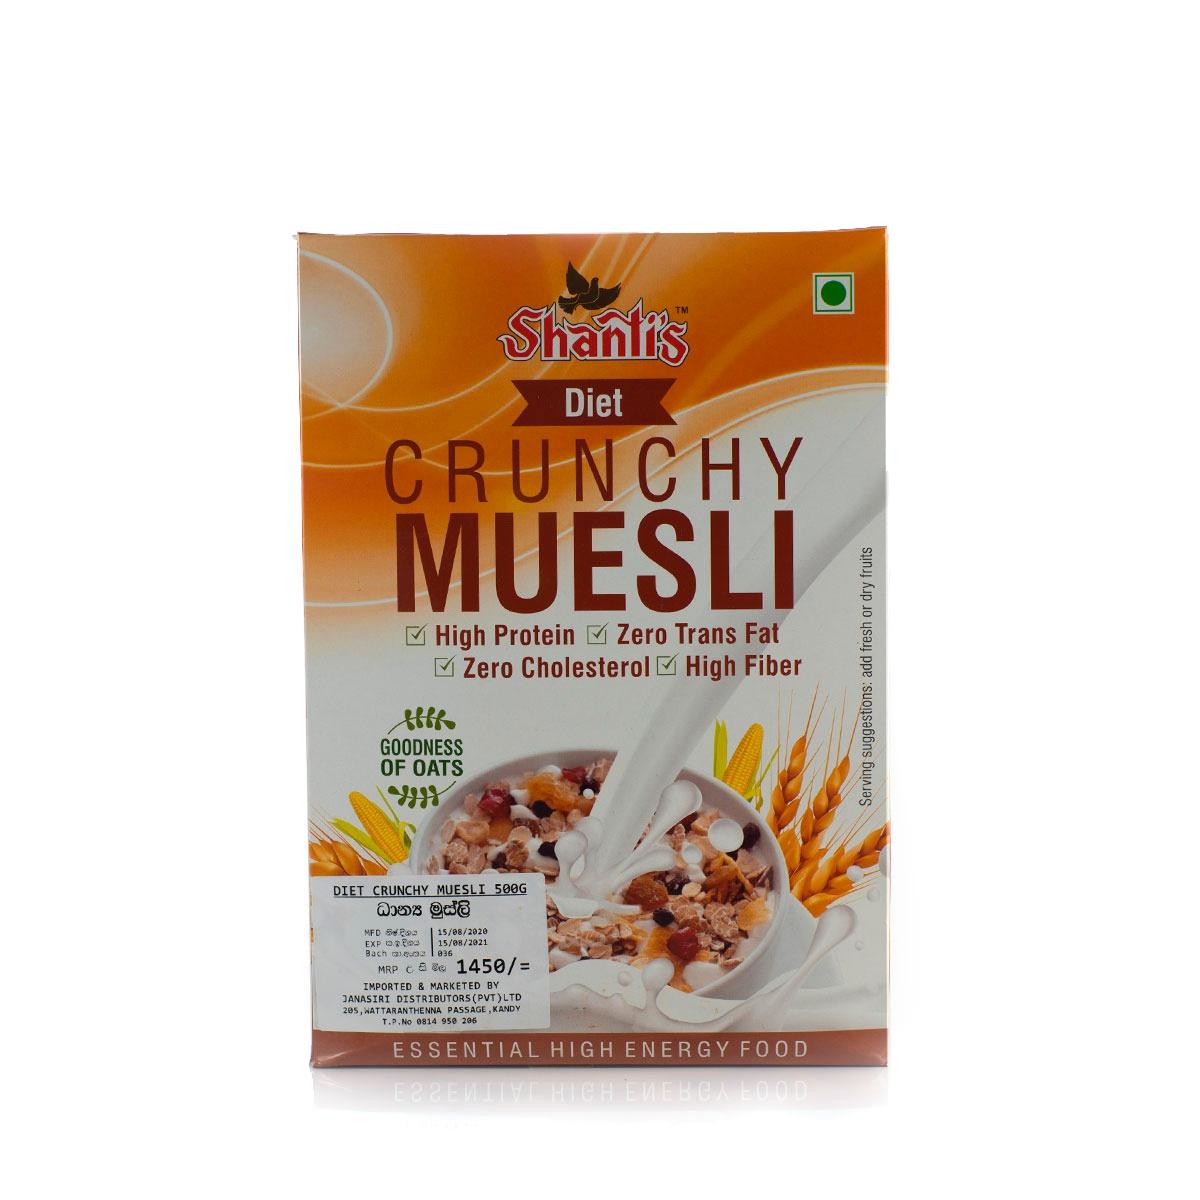 Shanti'S Diet Crunchy Muesli 500G - in Sri Lanka